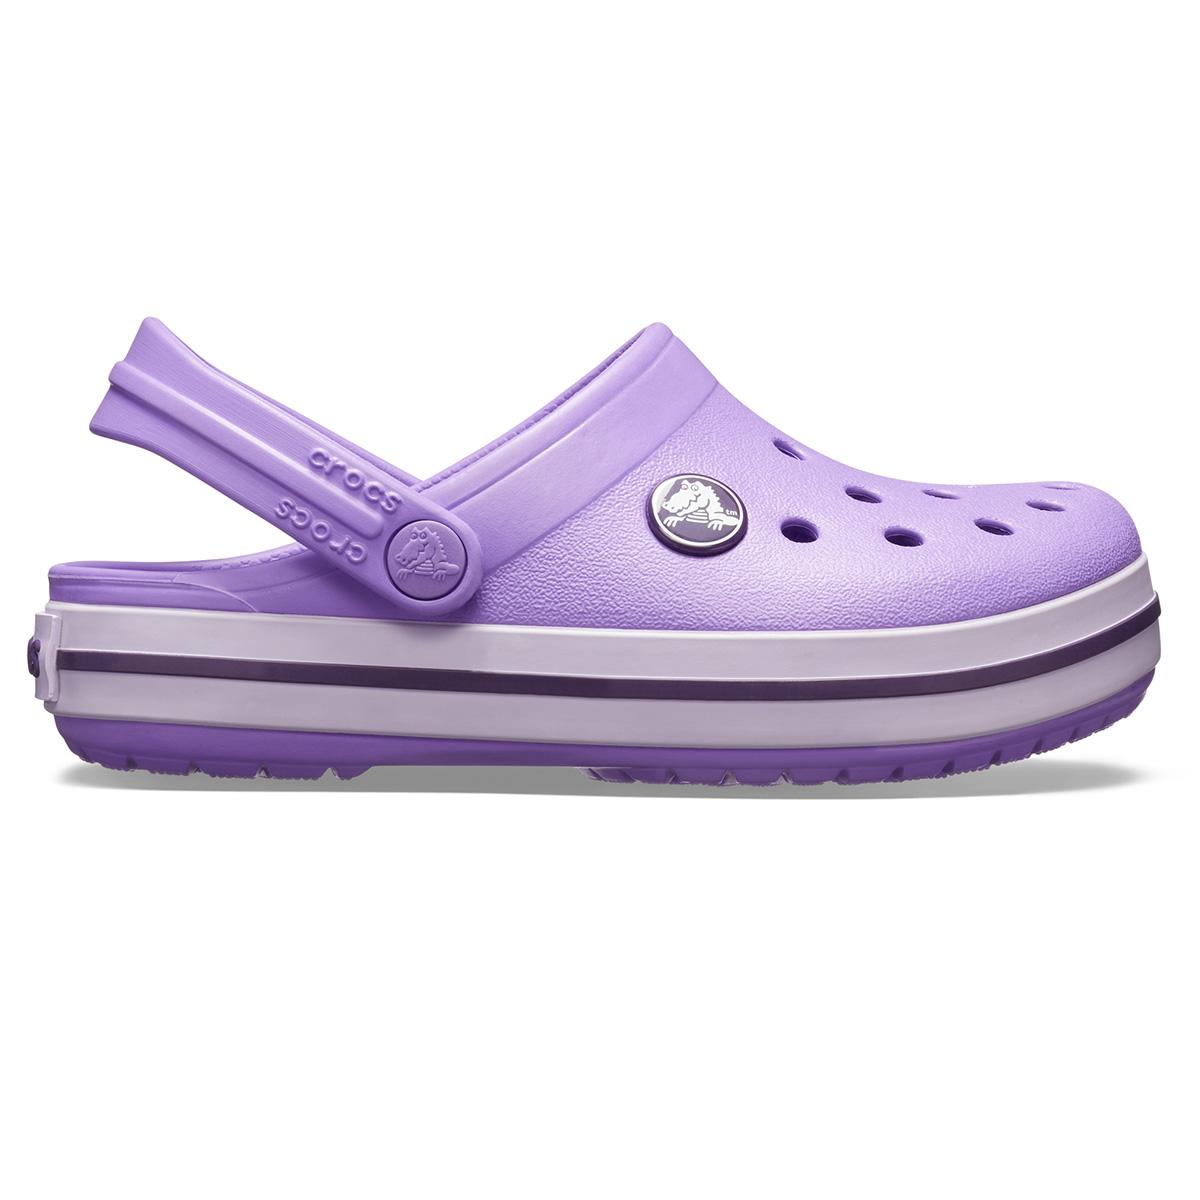 Crocs Crocband Clog K - Mor